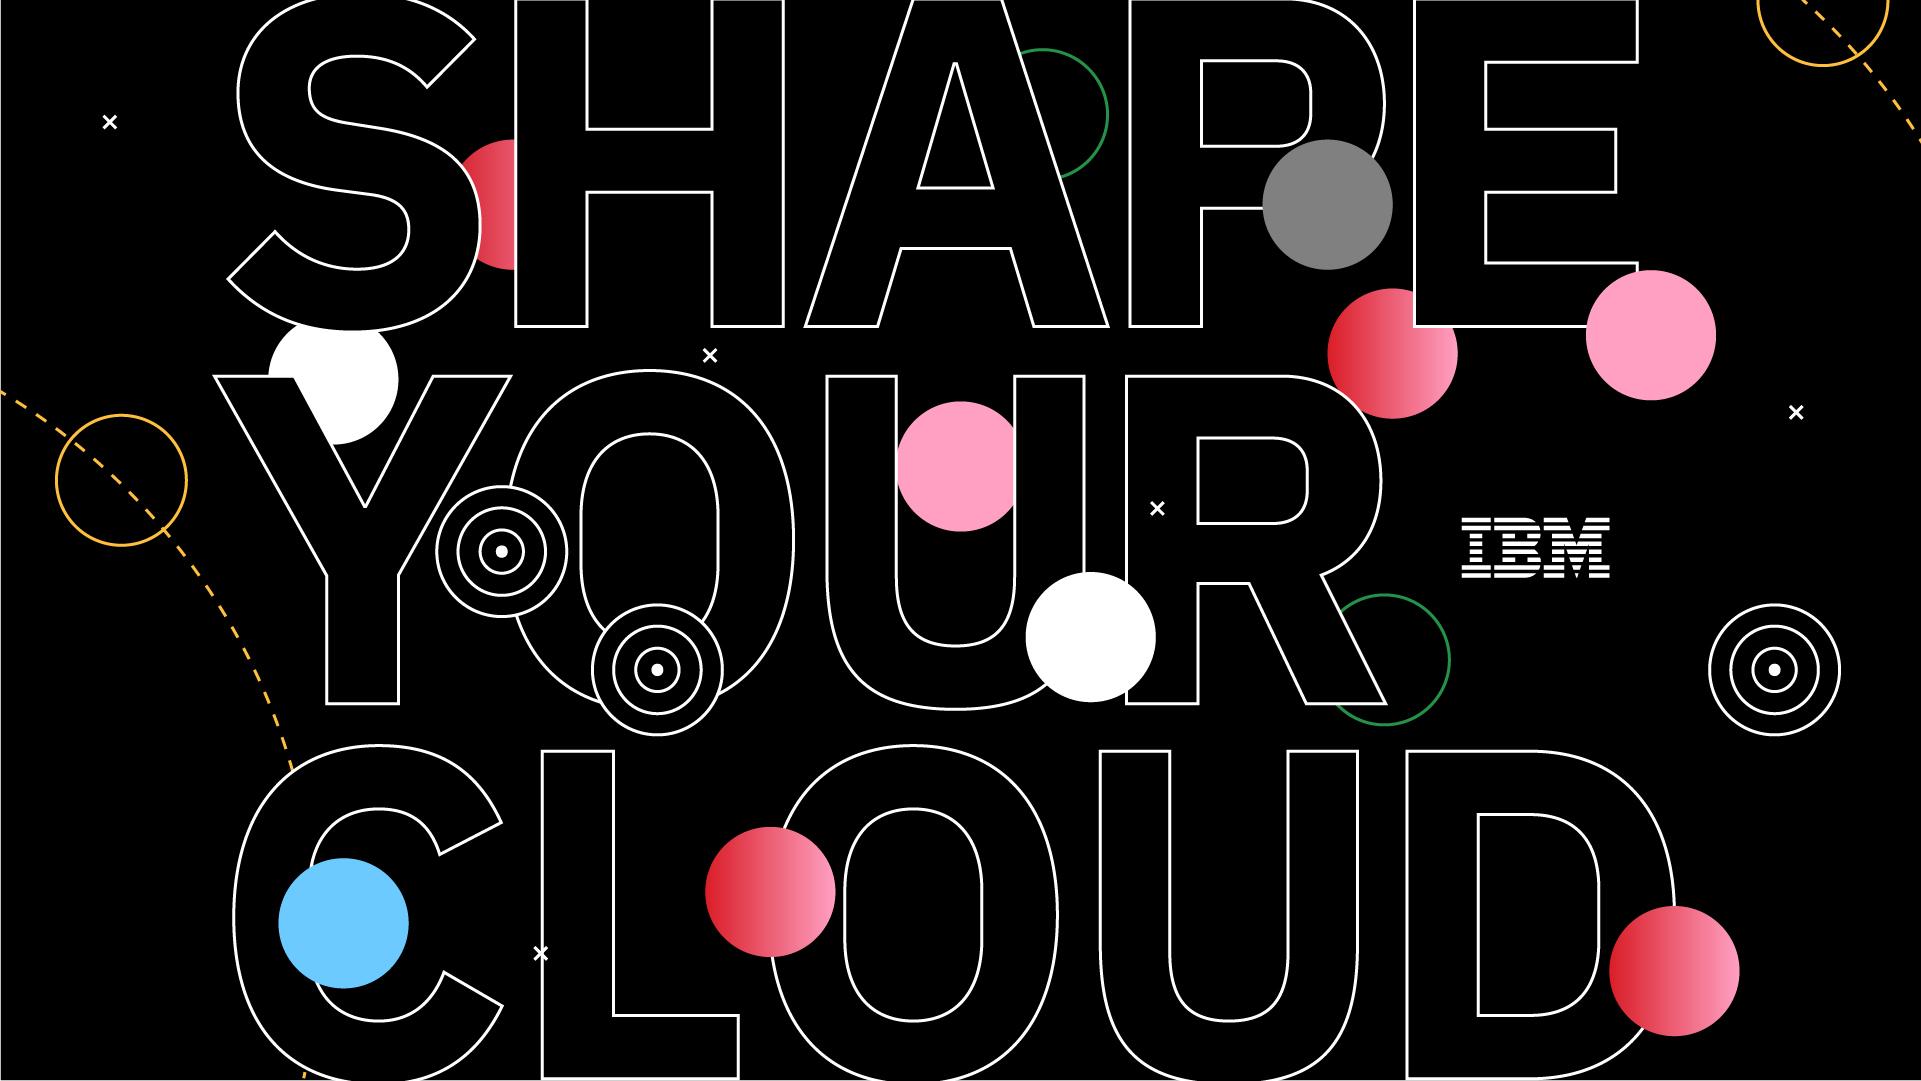 IBM_SHAPE-YOUR-CLOUD_DC_EDITS_BH_proceso_IBM-process-7.jpg